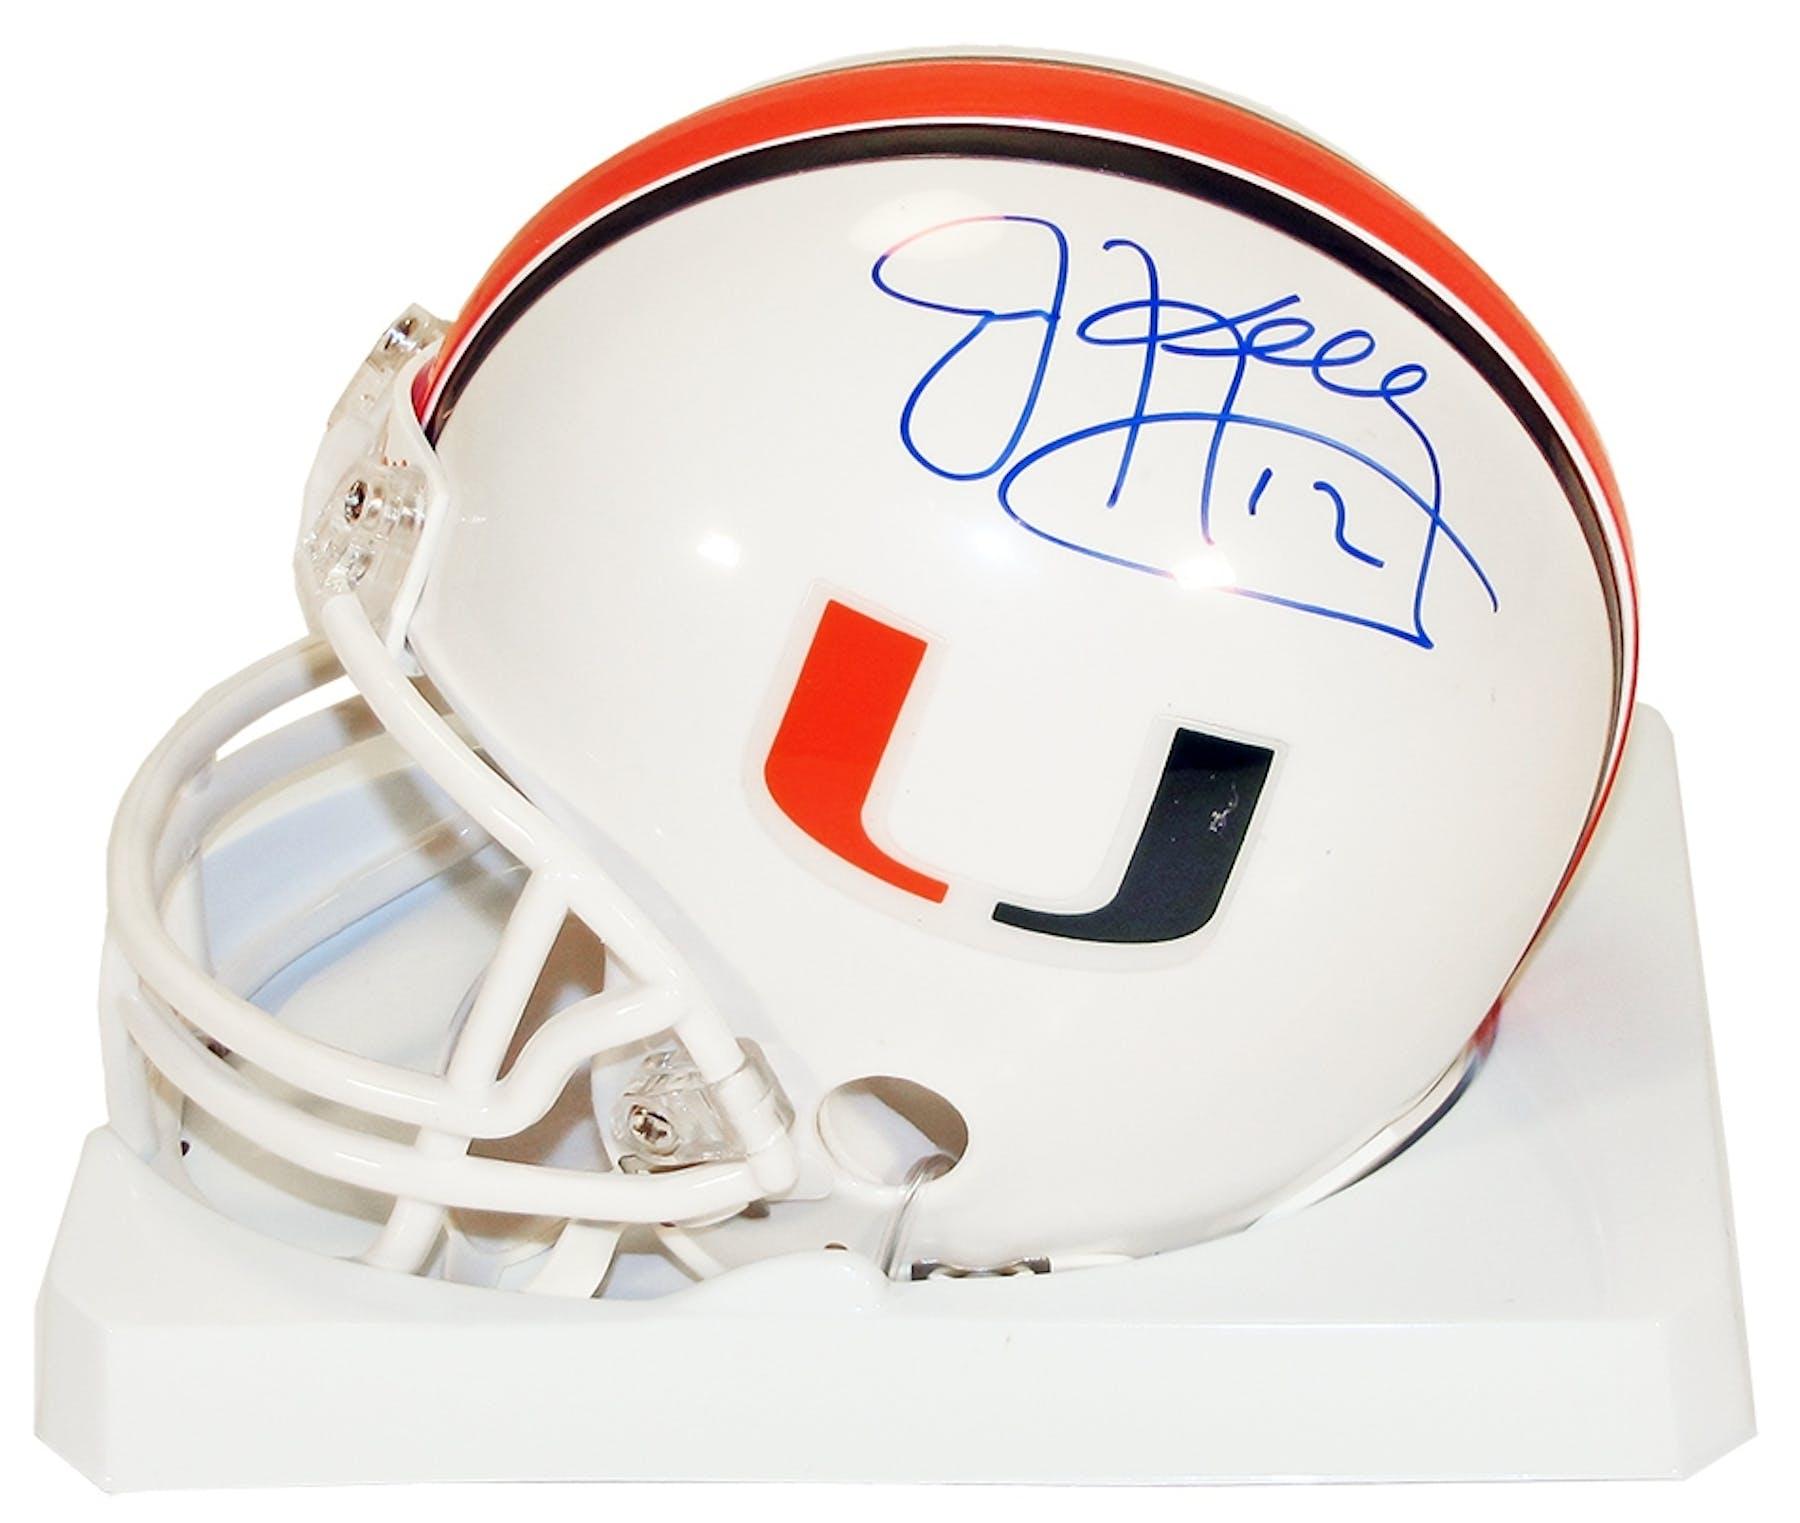 the best attitude 78874 9aba5 Jim Kelly Autographed University of Miami Hurricanes Football Mini Helmet